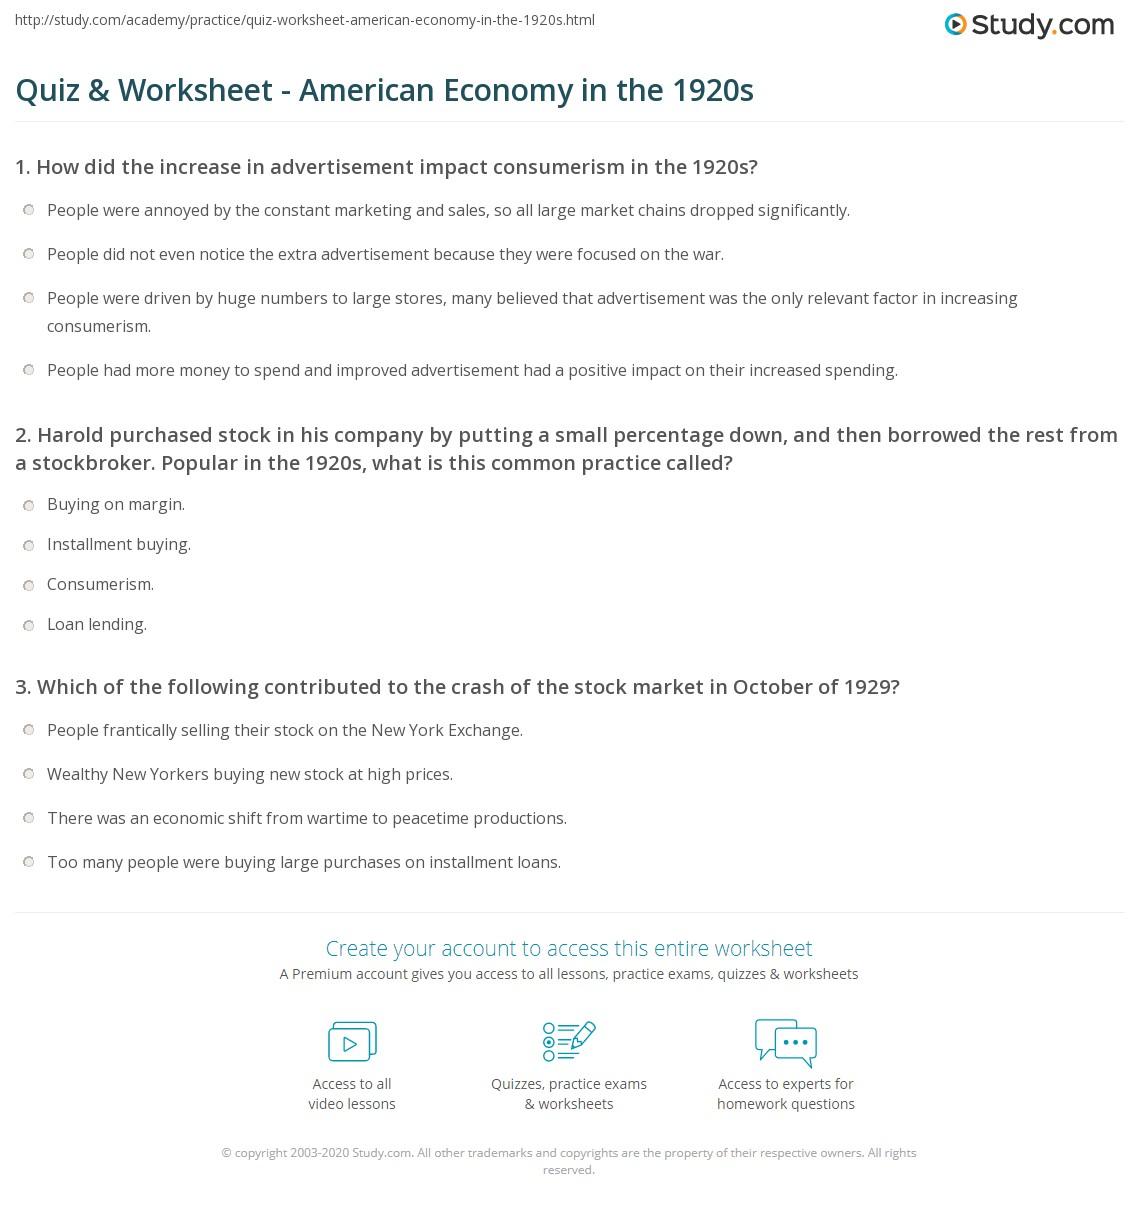 Quiz & Worksheet - American Economy in the 1920s   Study.com